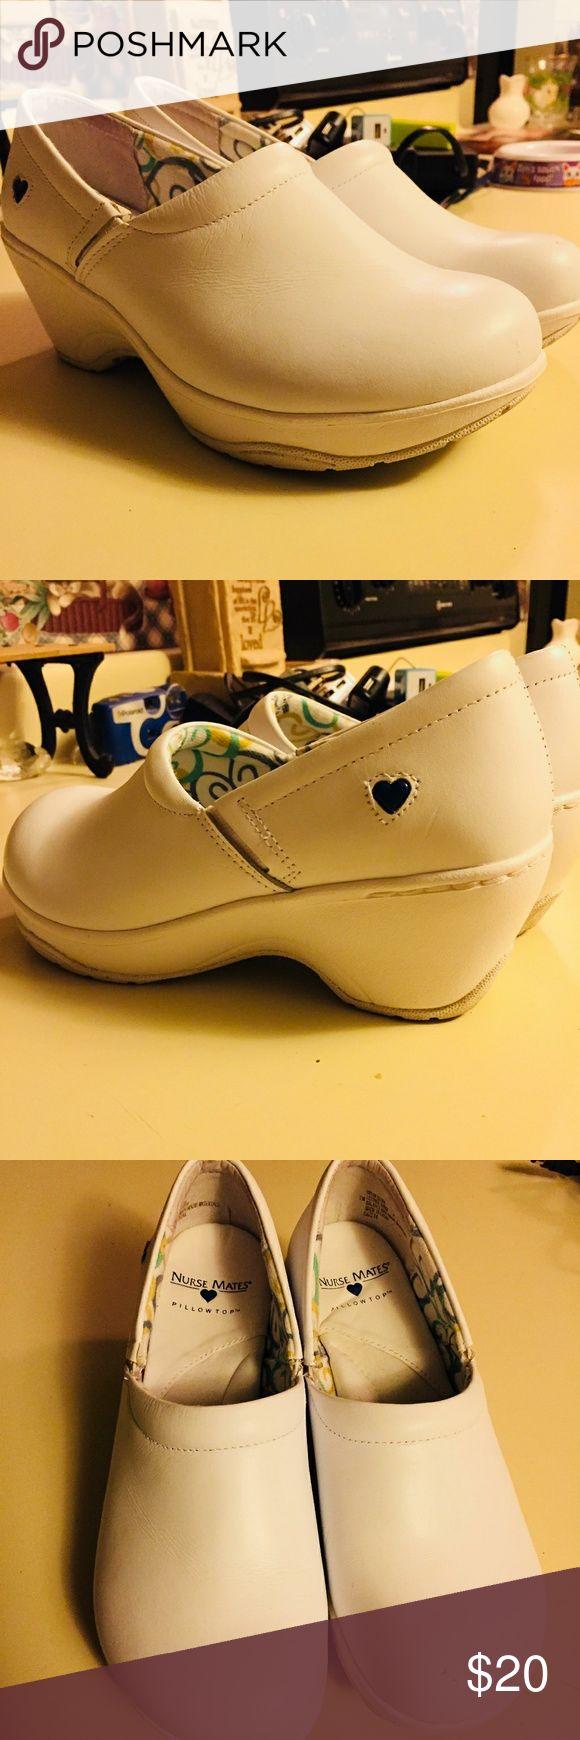 Nurse Mate Bryar Pillow Top Slip-ons Like new. Size 7. Nurse Mates Shoes